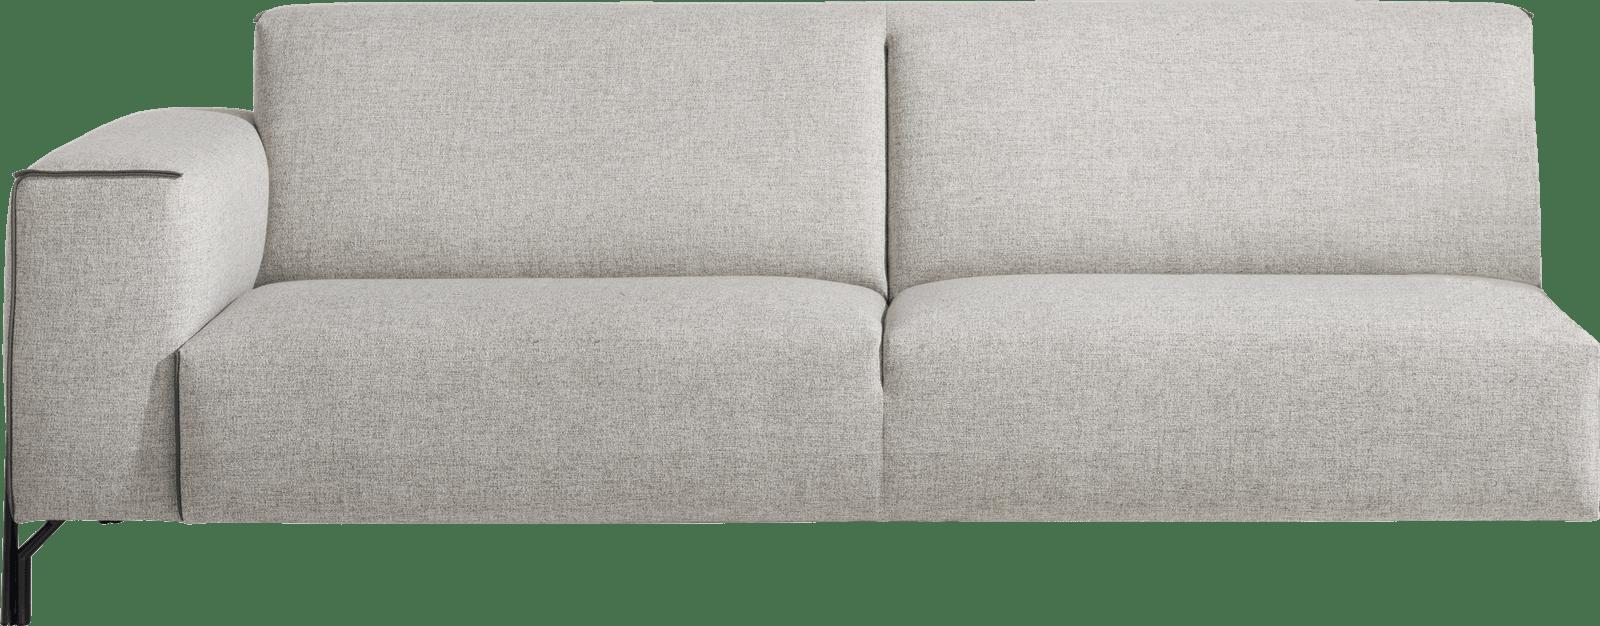 XOOON - Prizzi - Minimalistisches Design - Sofas - 3.5-sitzer armlehne links